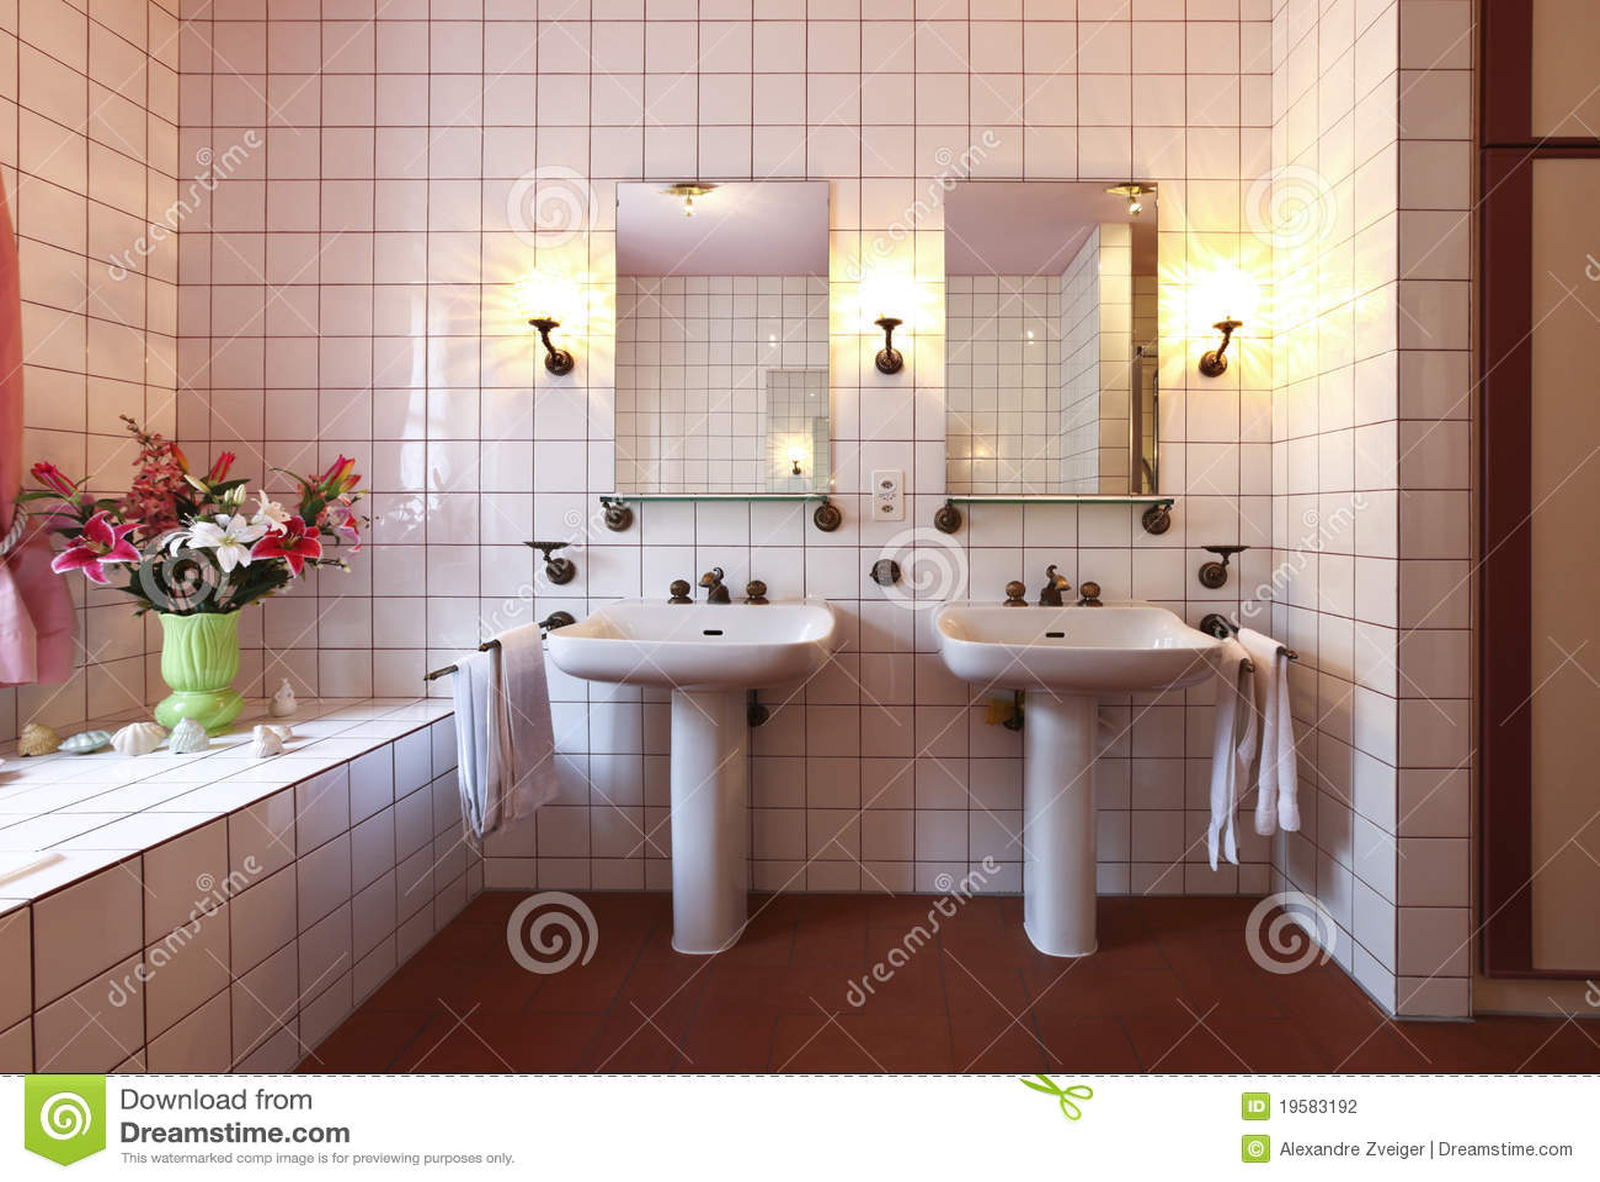 Mooie badkamers in klassieke stijl stock foto afbeelding 19583192 - Badkamers ...